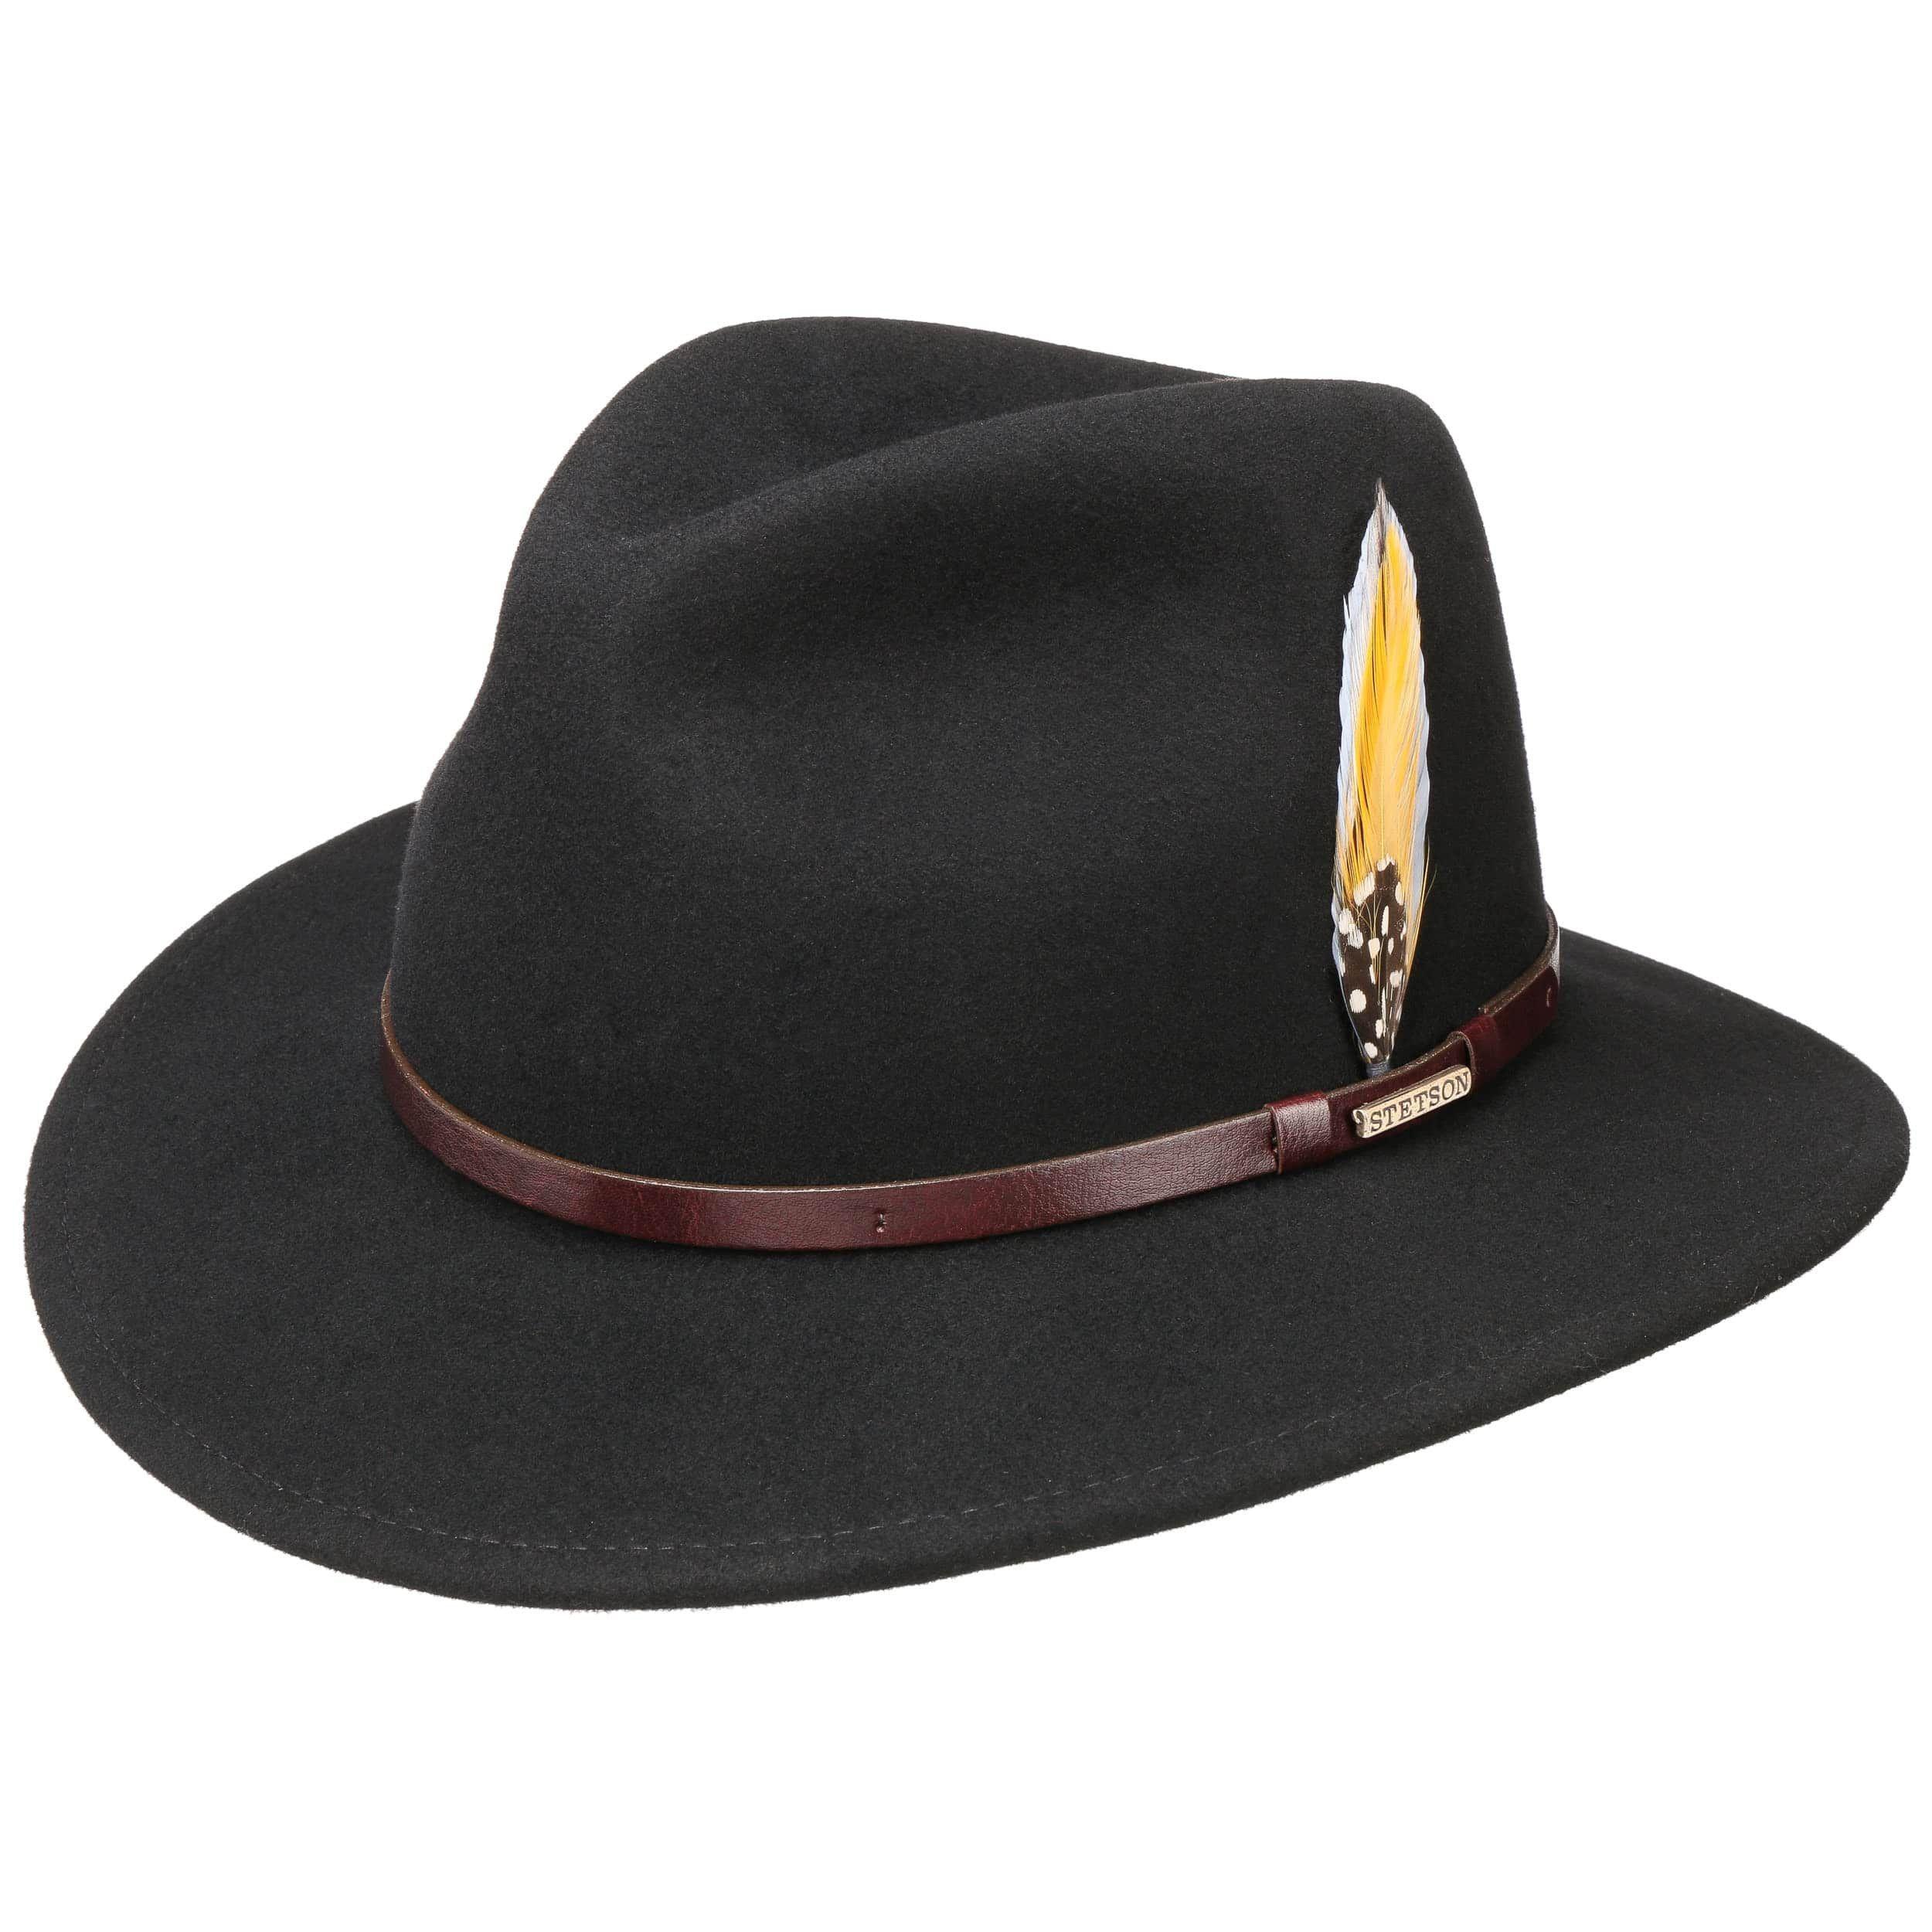 Trandell VitaFelt Traveller Hat black